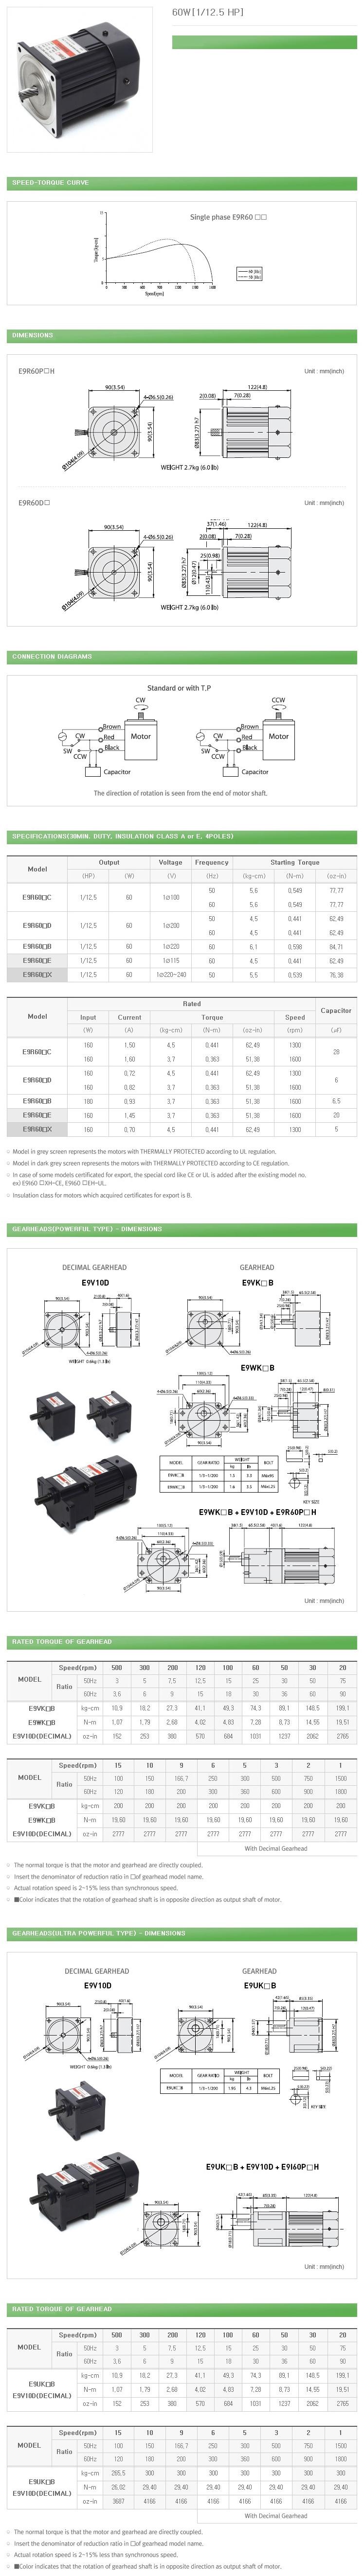 DAEHWA E/M Reversible Motor (60W, 1/12.5 HP)